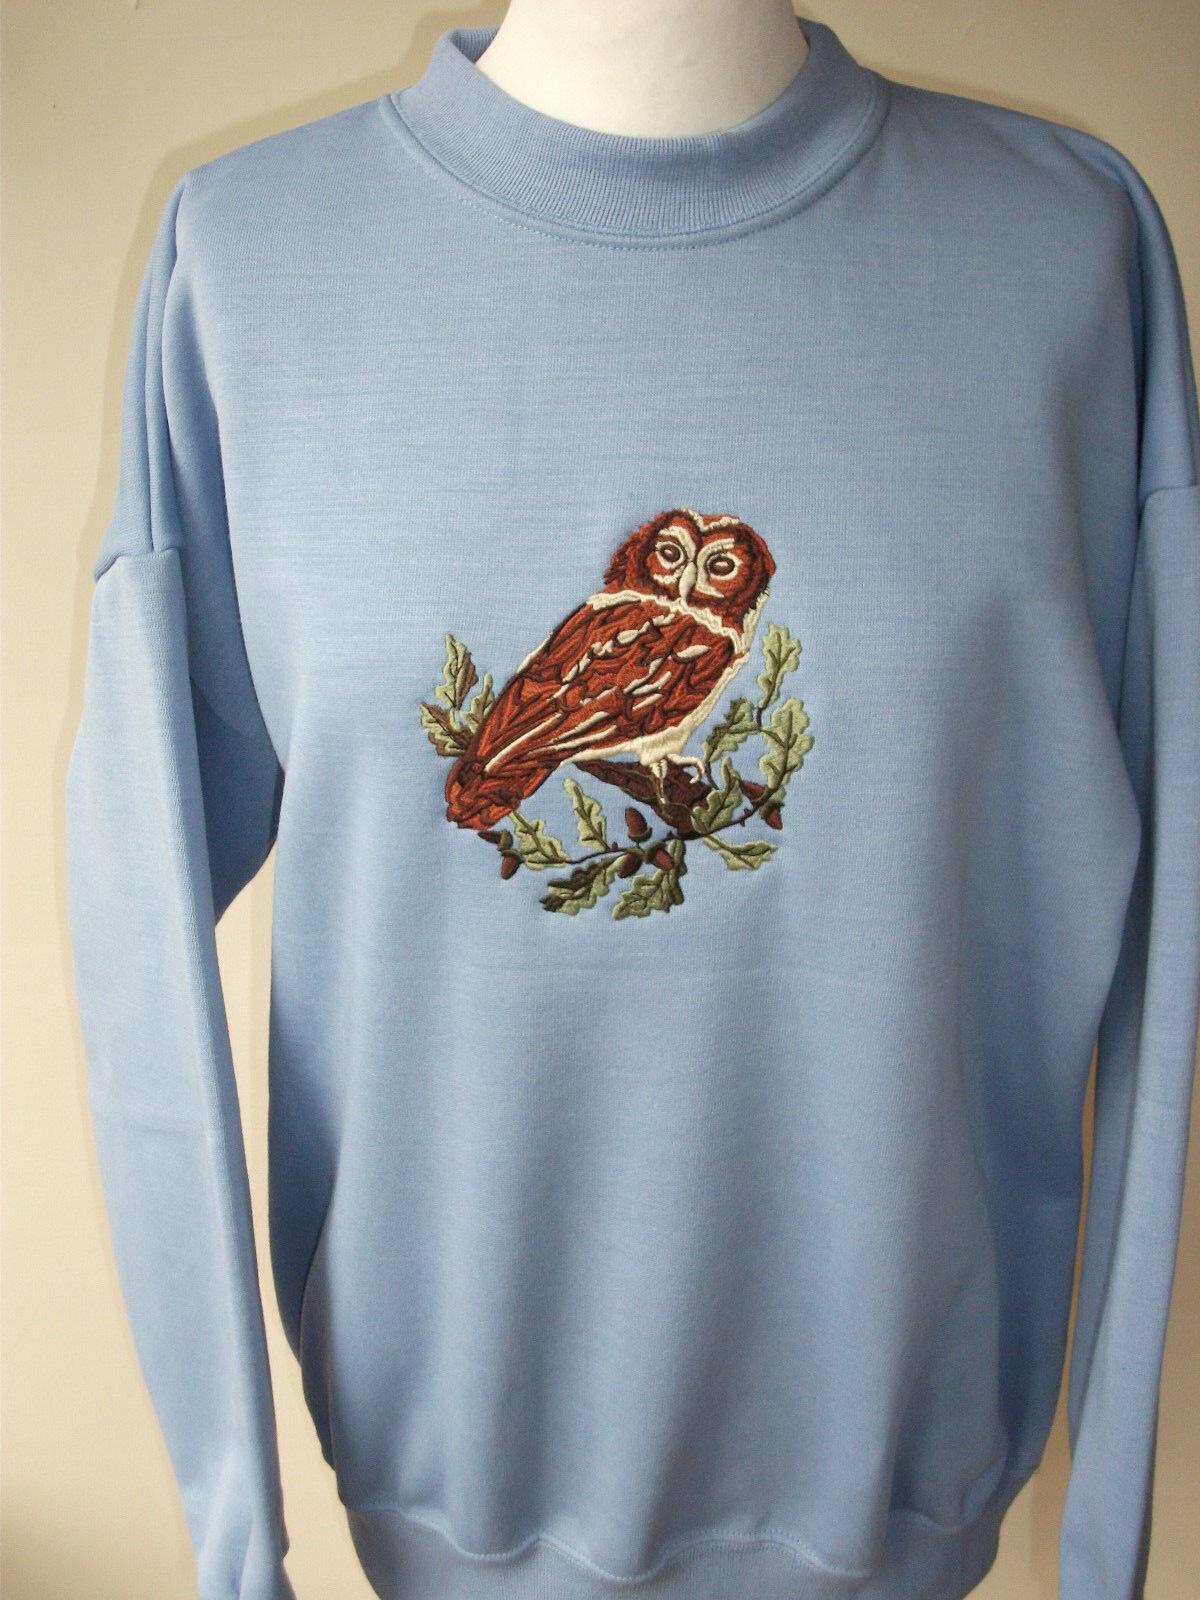 LADIES SWEATSHIRT,JUMPER,TOP WITH AN EMBROIDERED OWL BIRD DESIGN purpleC